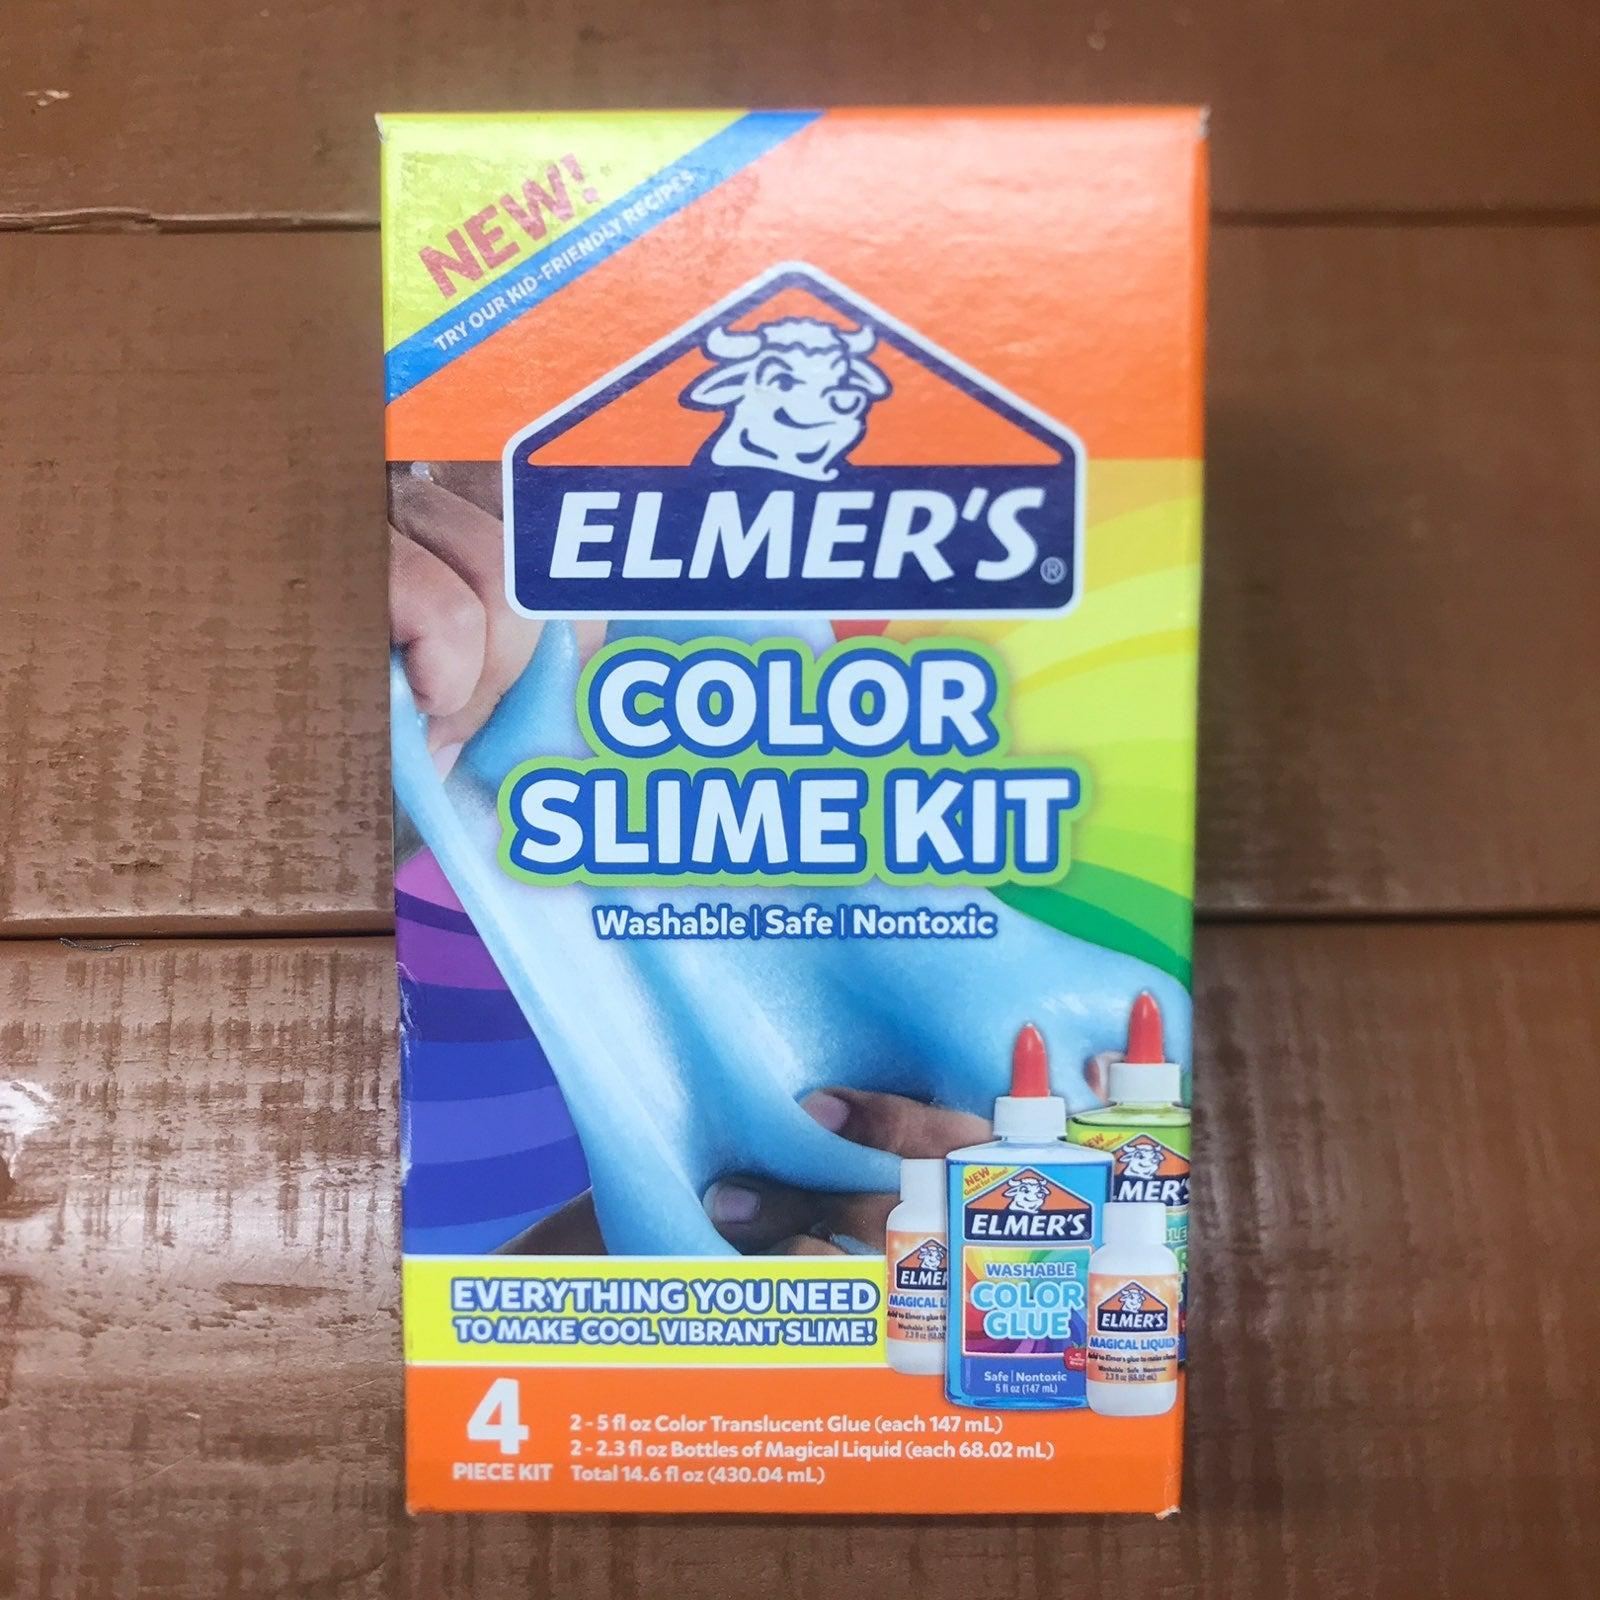 Elmer's Color Slime Kit